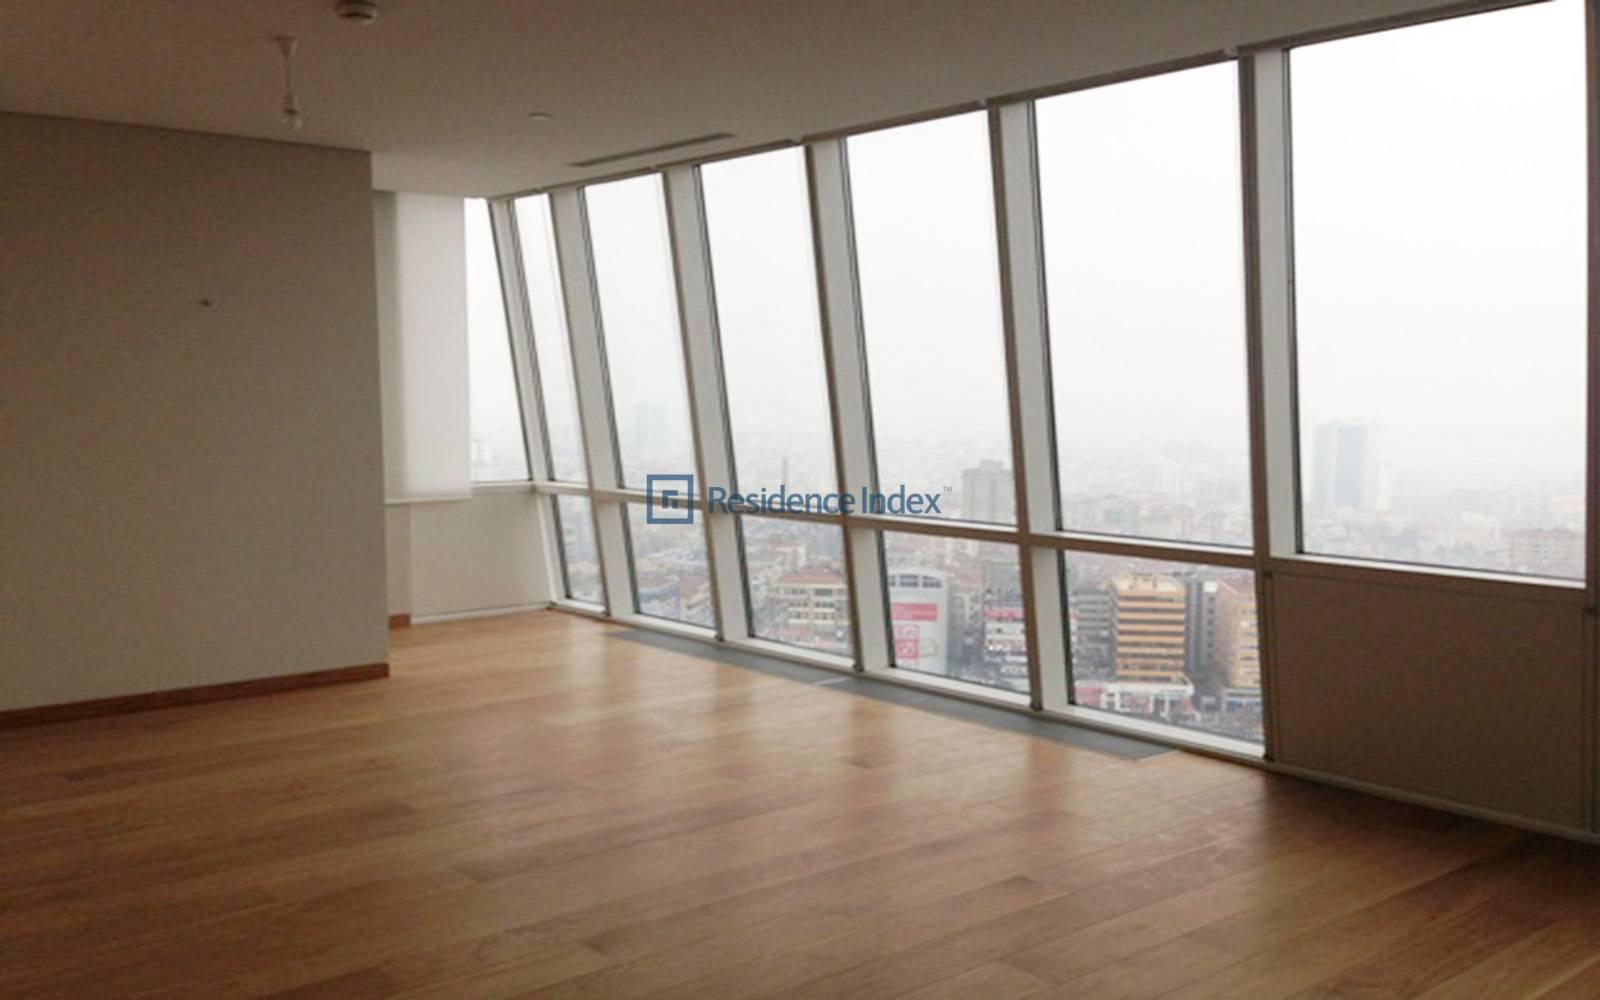 Trump Towers - Good Location 1 + 1 Apartment on a High Floor